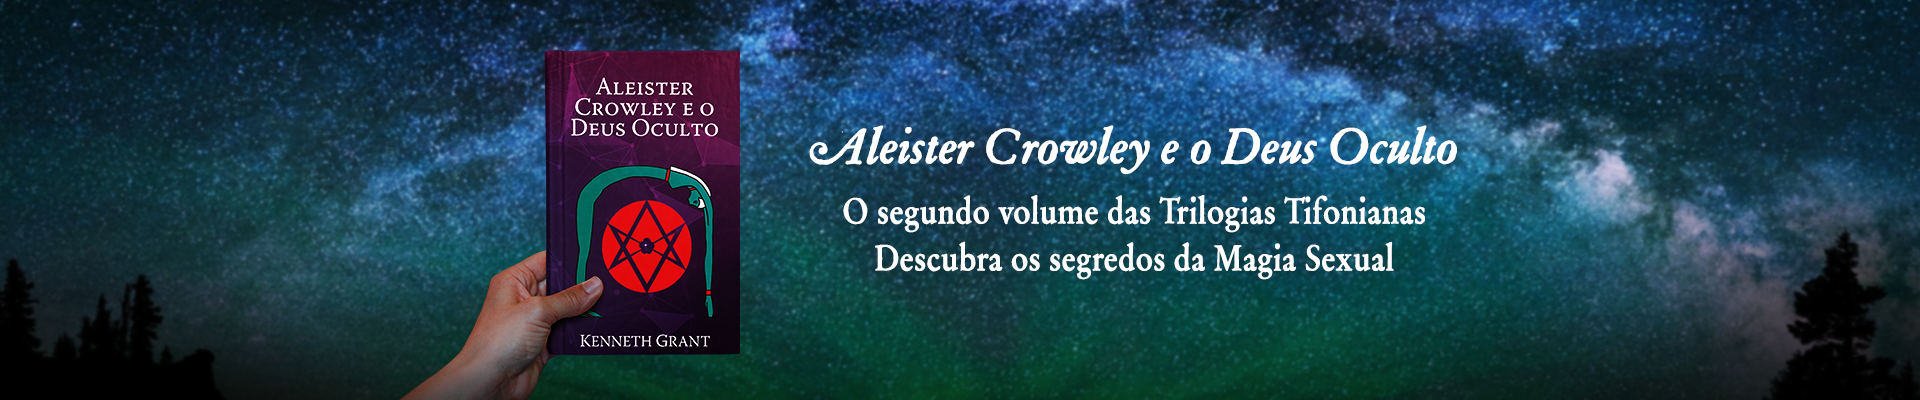 Aleister Crowley e o Deus Oculto